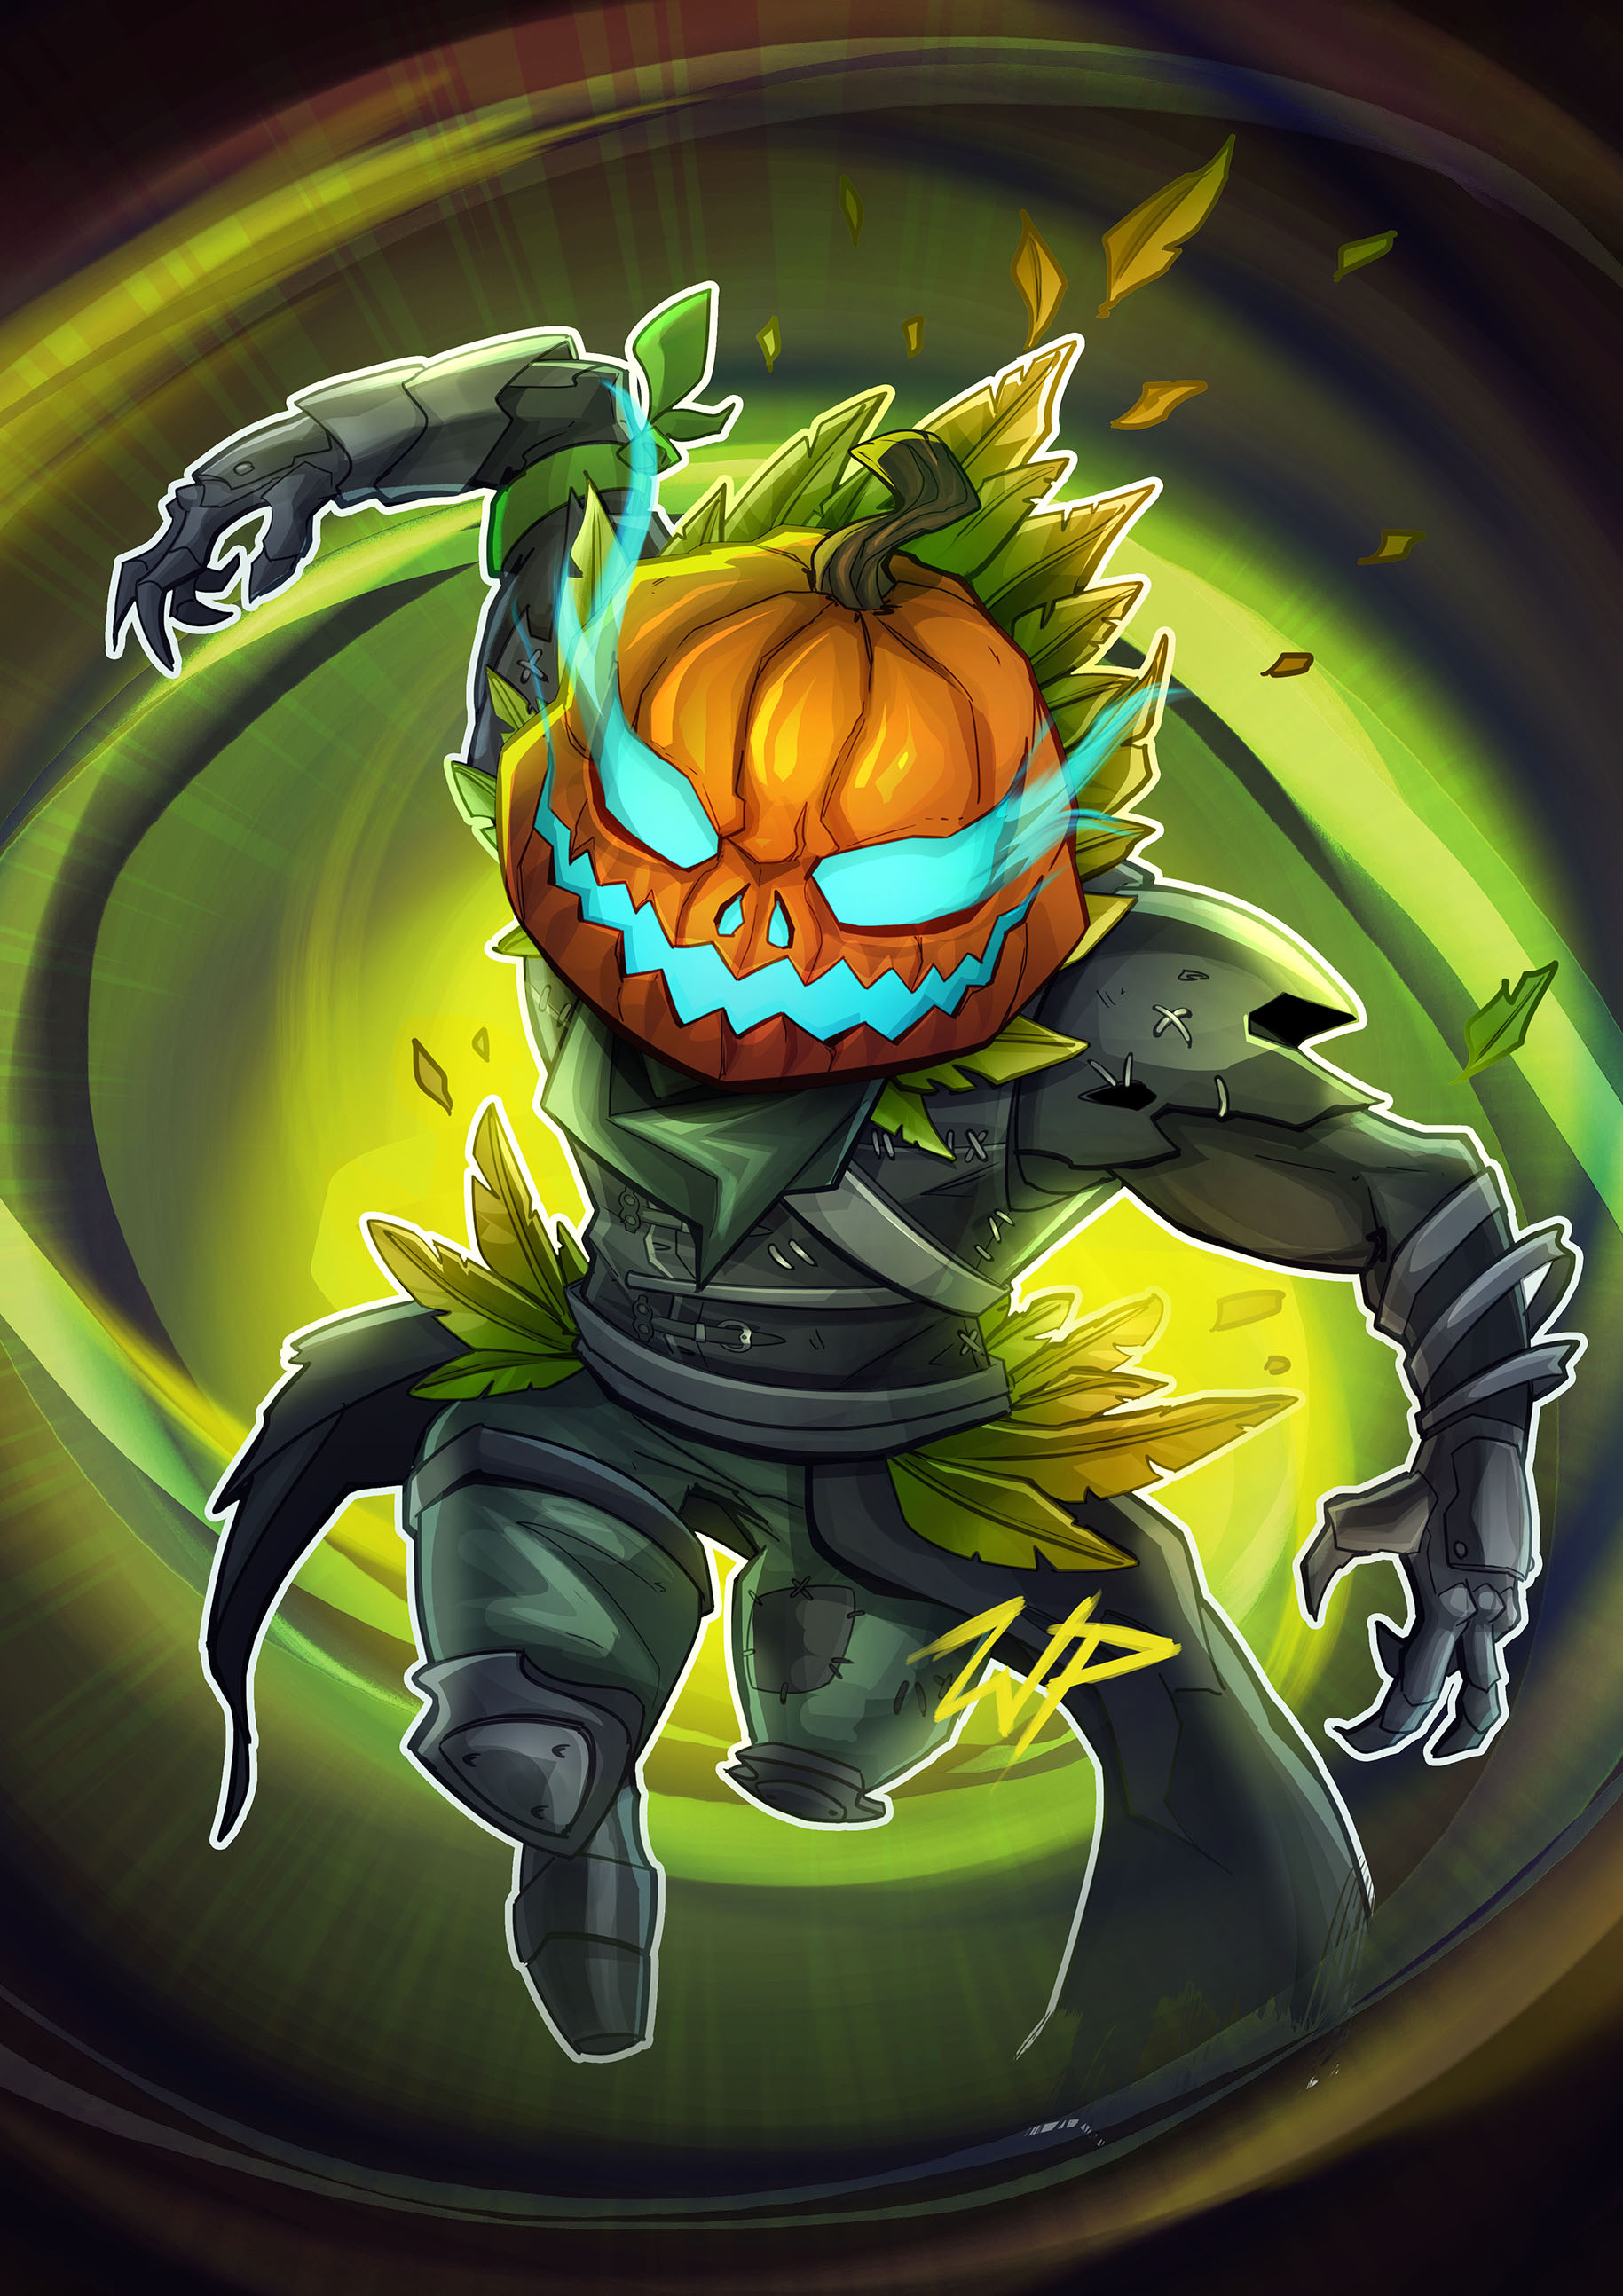 Fortnite Halloween Wallpaper Posted By Ryan Mercado